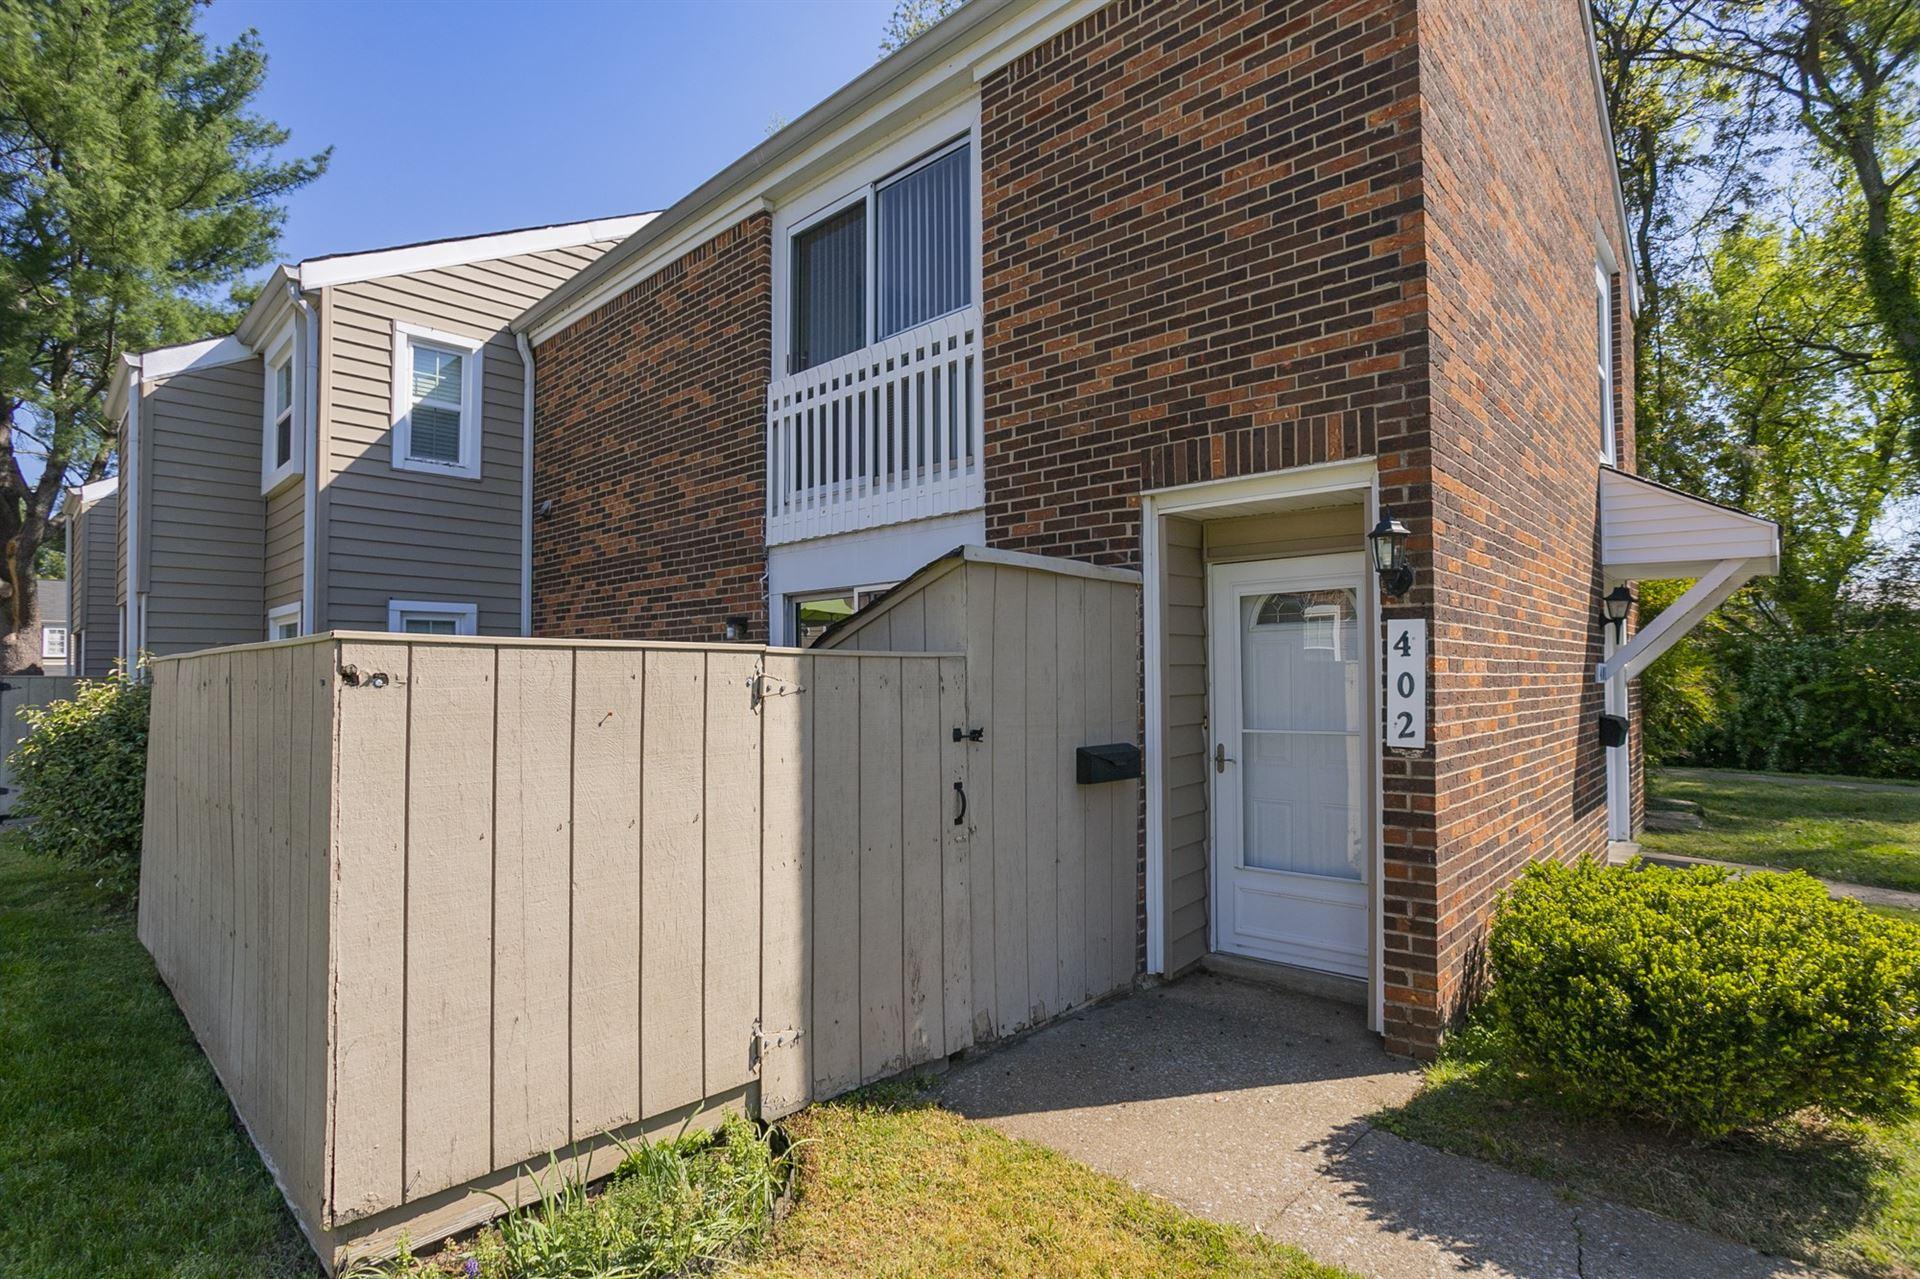 Photo of 402 Granville Rd, Franklin, TN 37064 (MLS # 2244306)